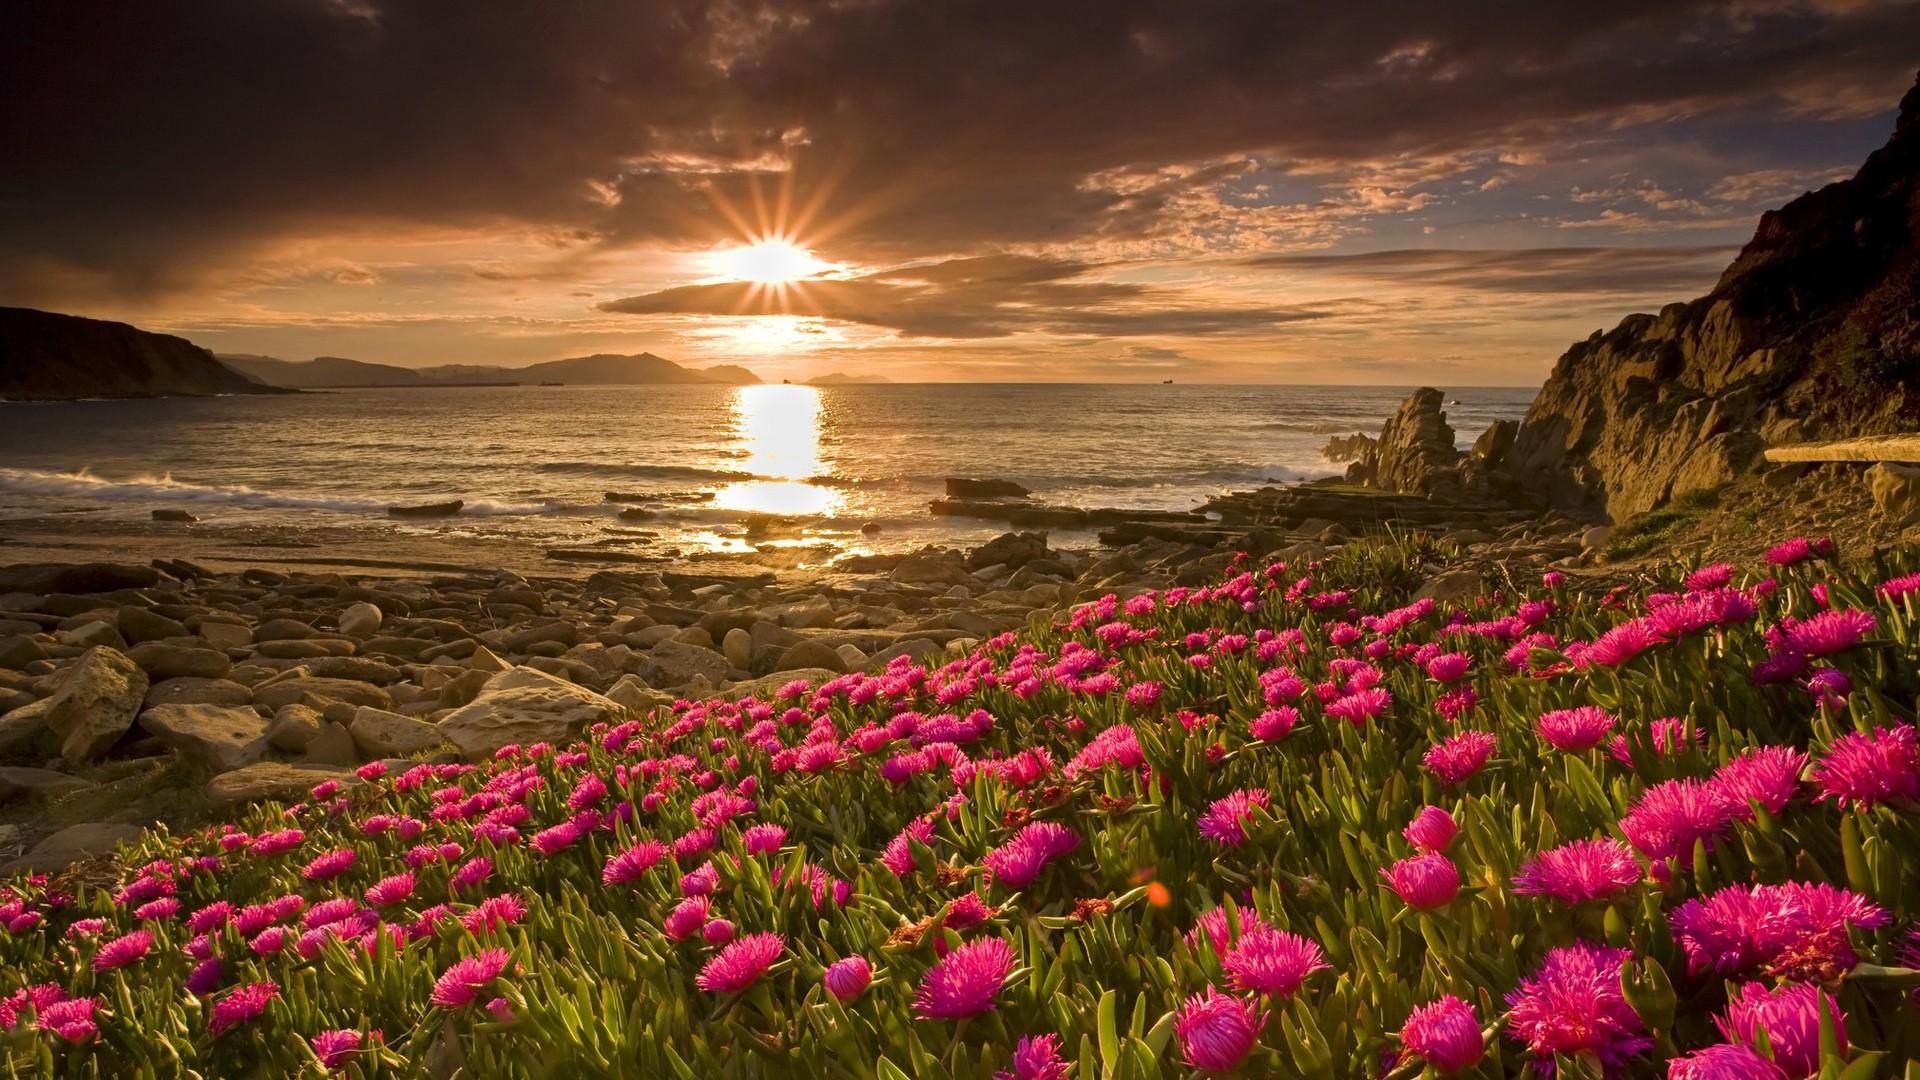 flower landscape hd nature aa